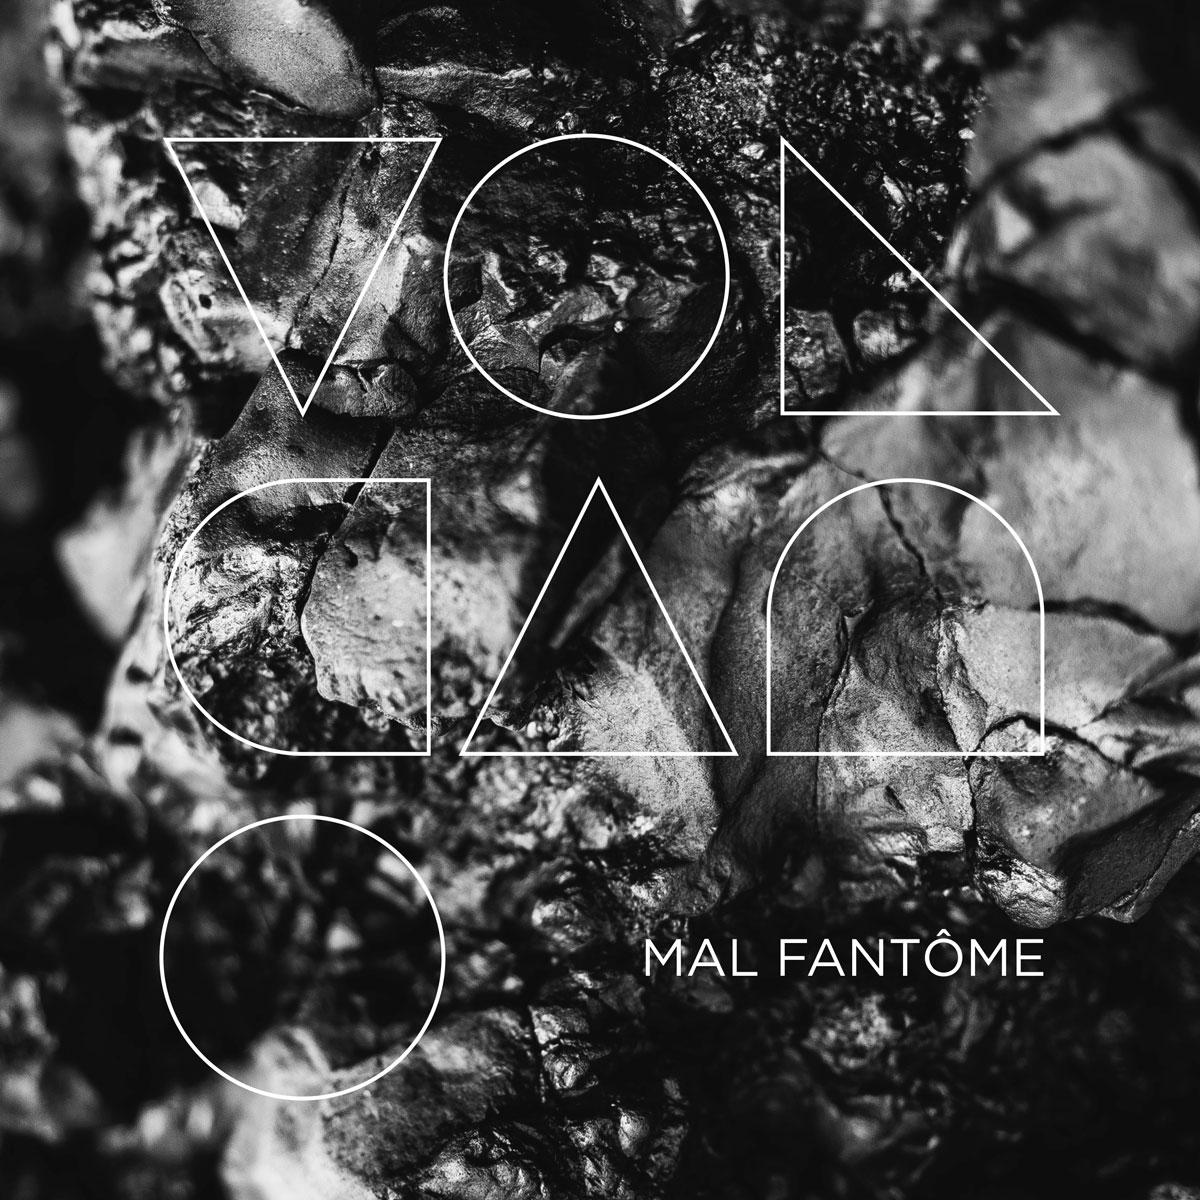 Mal Fantôme | Volcano - Available on Spotify, Apple Music, Deezer, YouTube, etc.